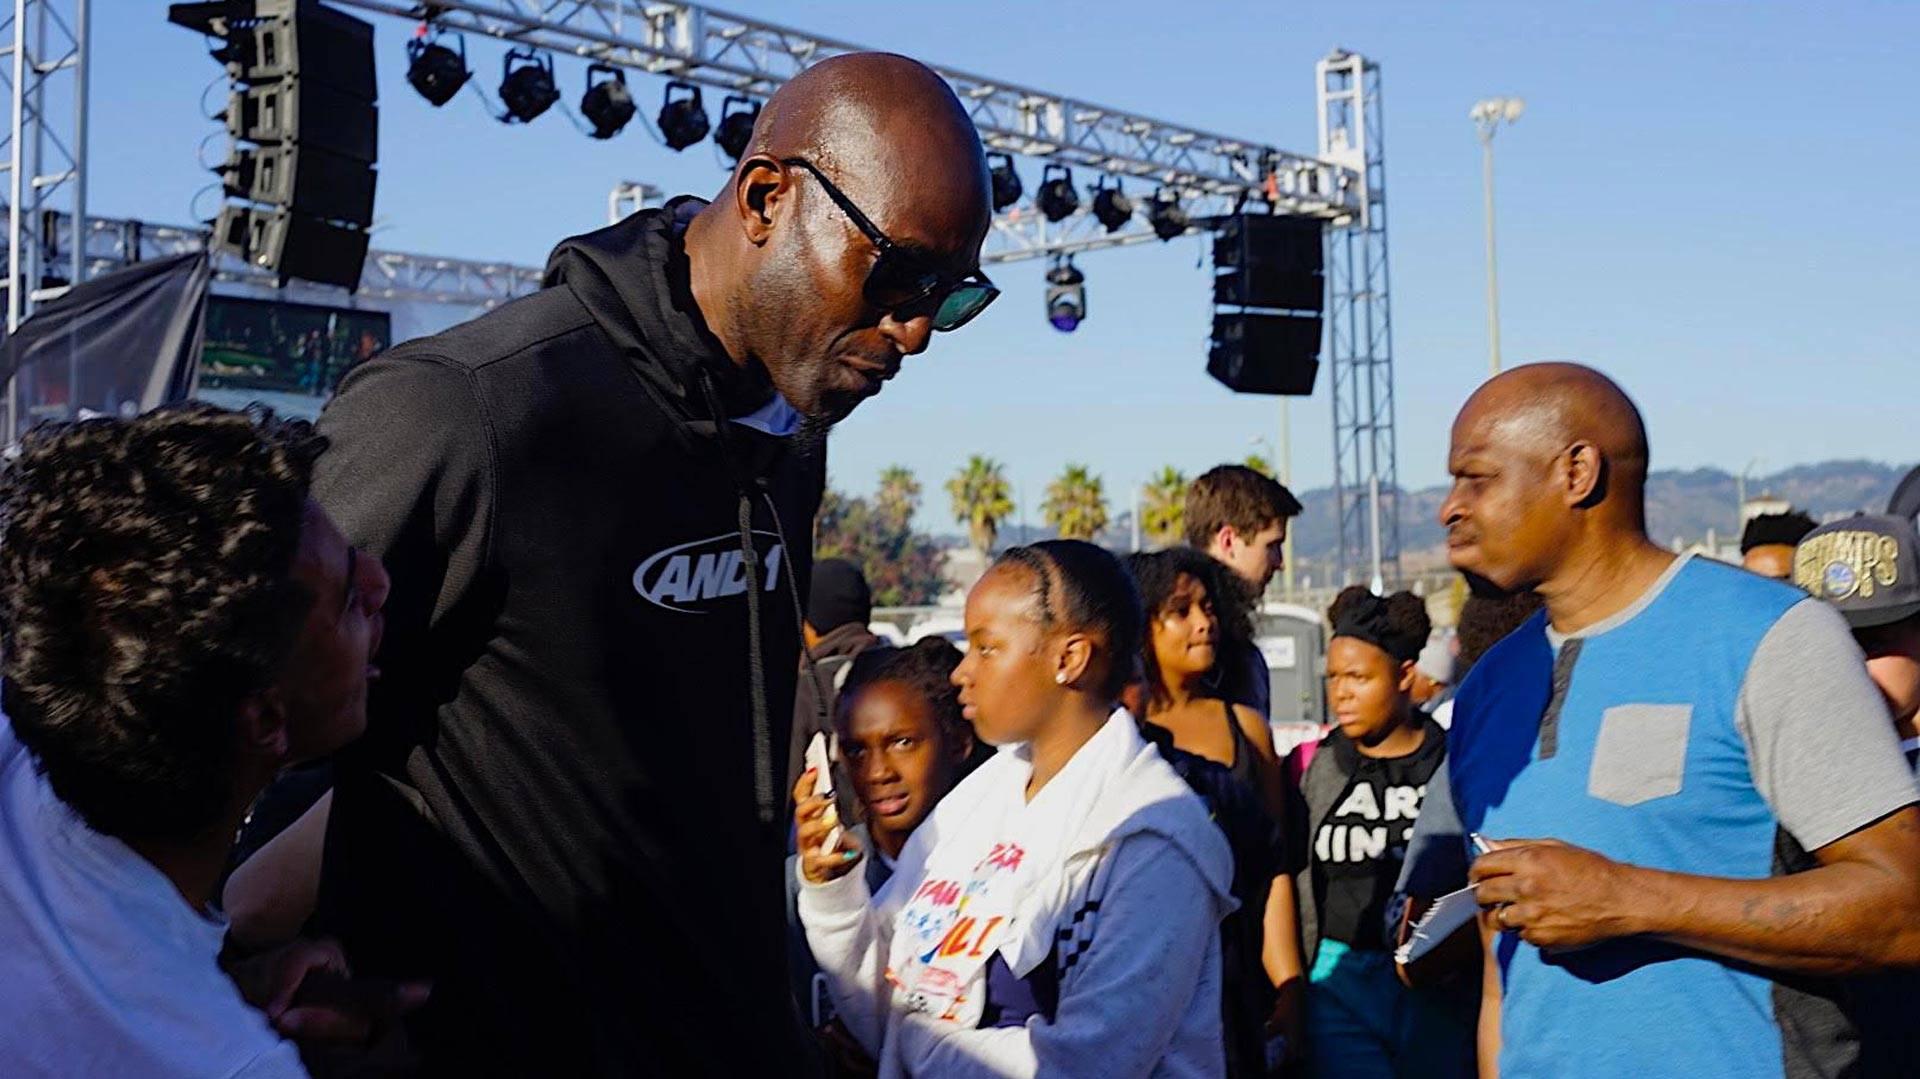 Kevin Garnett talks to kids at DeFremery Park in West Oakland, Oct. 12, 2018. Pendarvis Harshaw